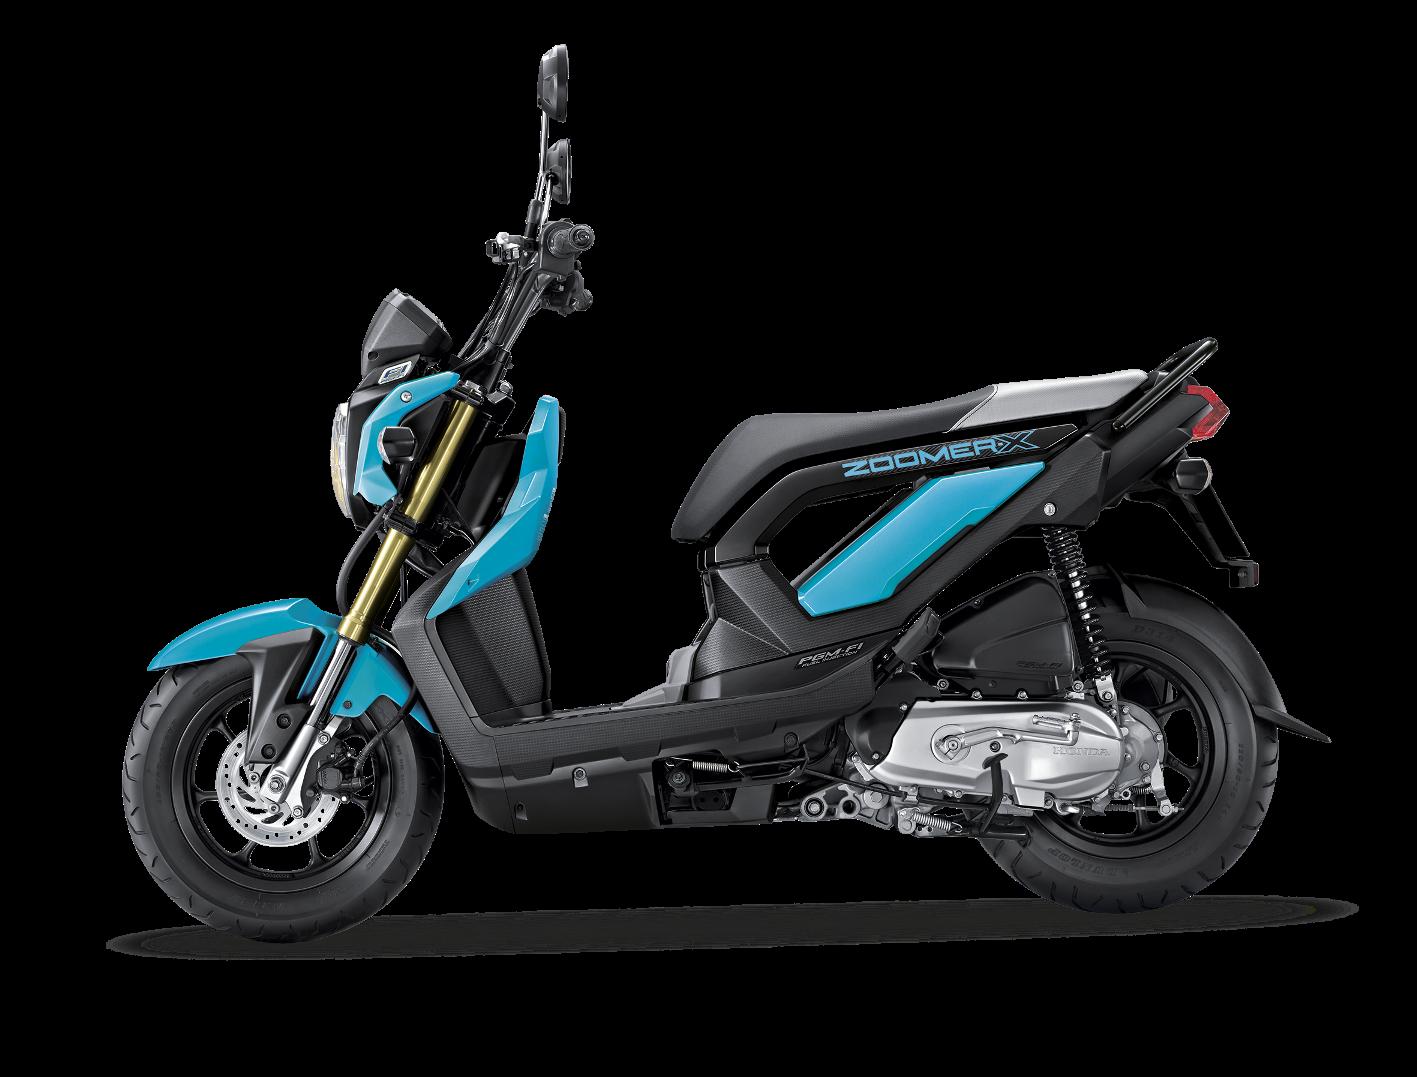 Honda Zoomer X Blue Hires Dekorasi